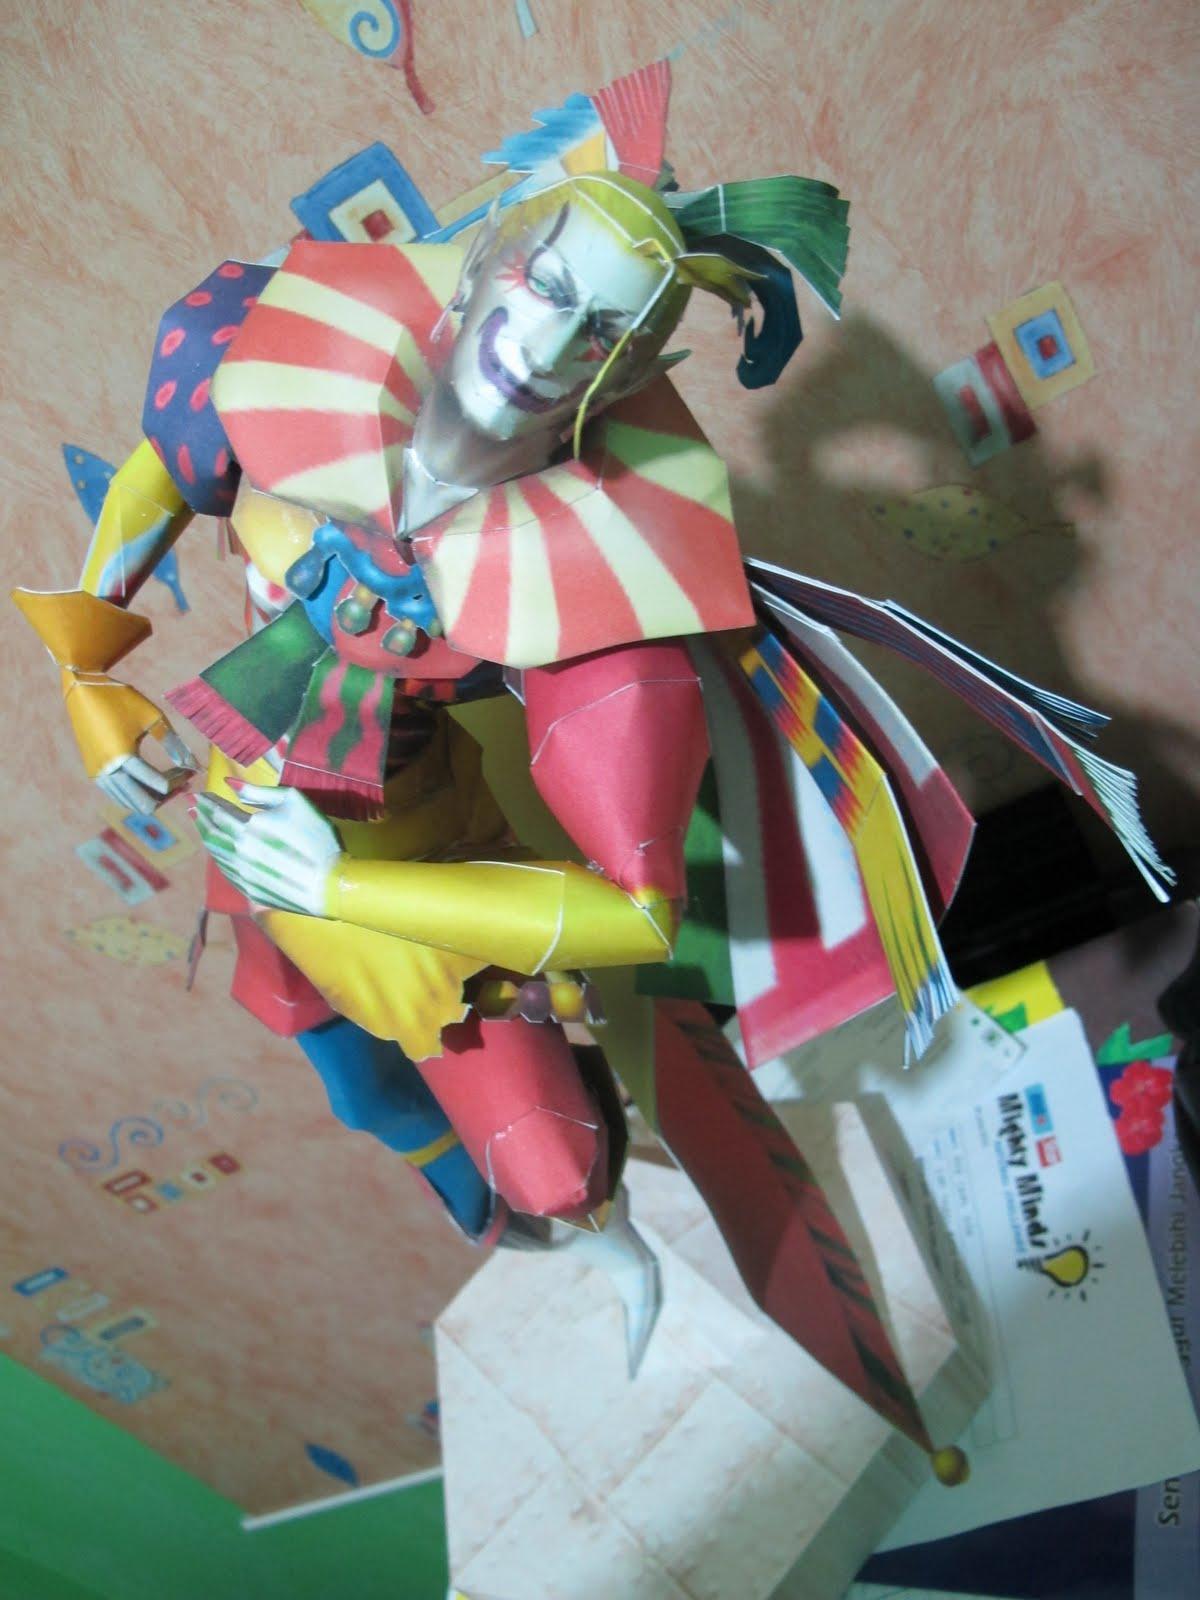 https://4.bp.blogspot.com/-8fbP57sqUgE/Tgdji6oI3UI/AAAAAAAACuo/jSIEllxzeFo/s1600/Dissidia+012+Final+Fantasy.+Kefka+Palazzo+Papercraft1.JPG